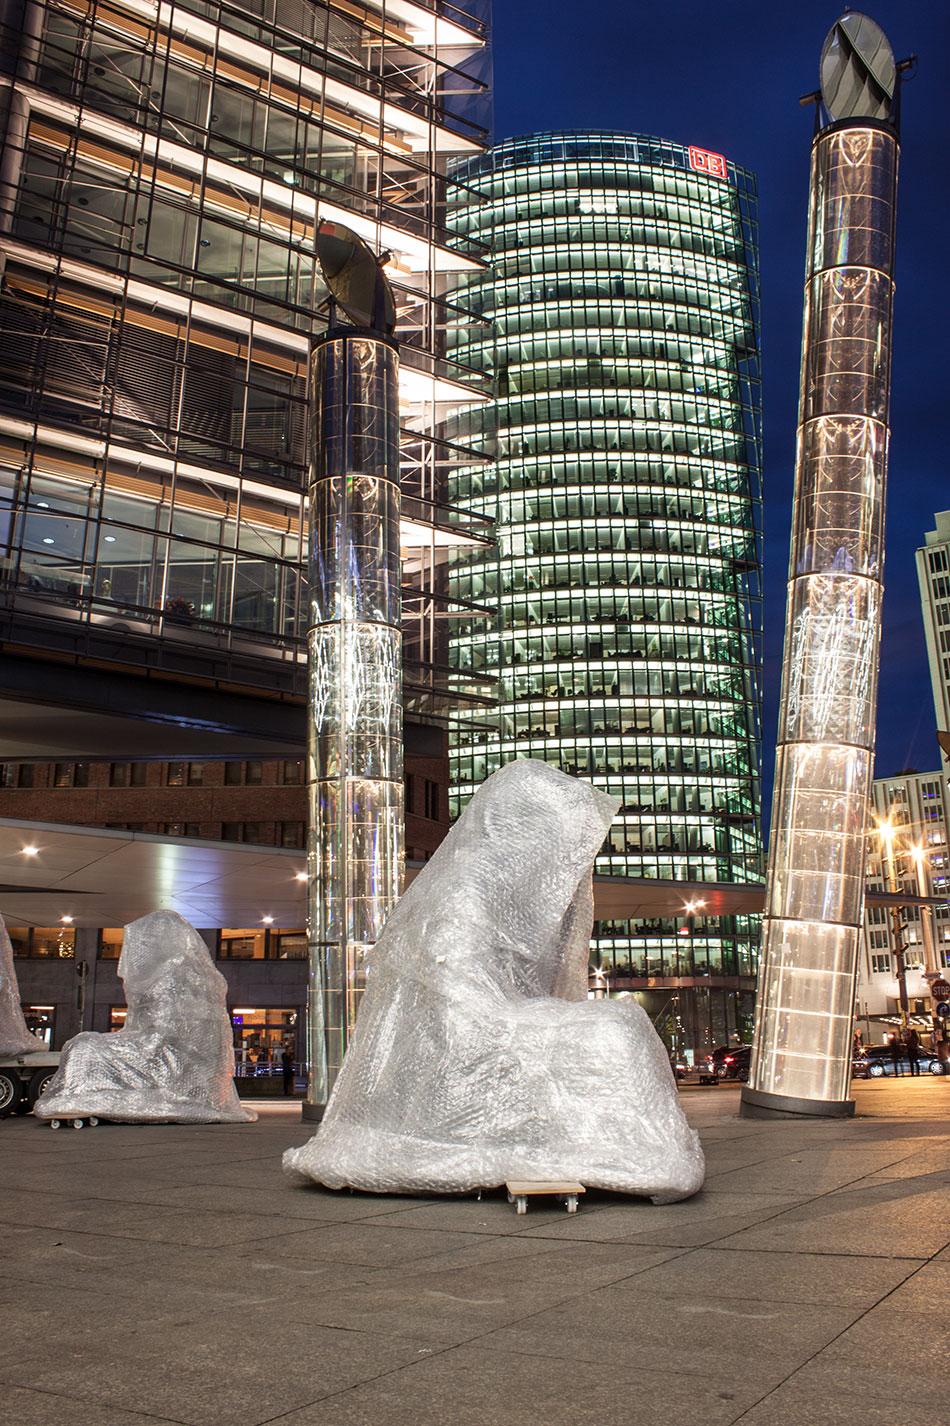 festival-of-lights-berlin-light-art-festival-contemporary-fine-art-design-show-guardiansof-time-manfred-kili-kielnhofer-sculpture-2869